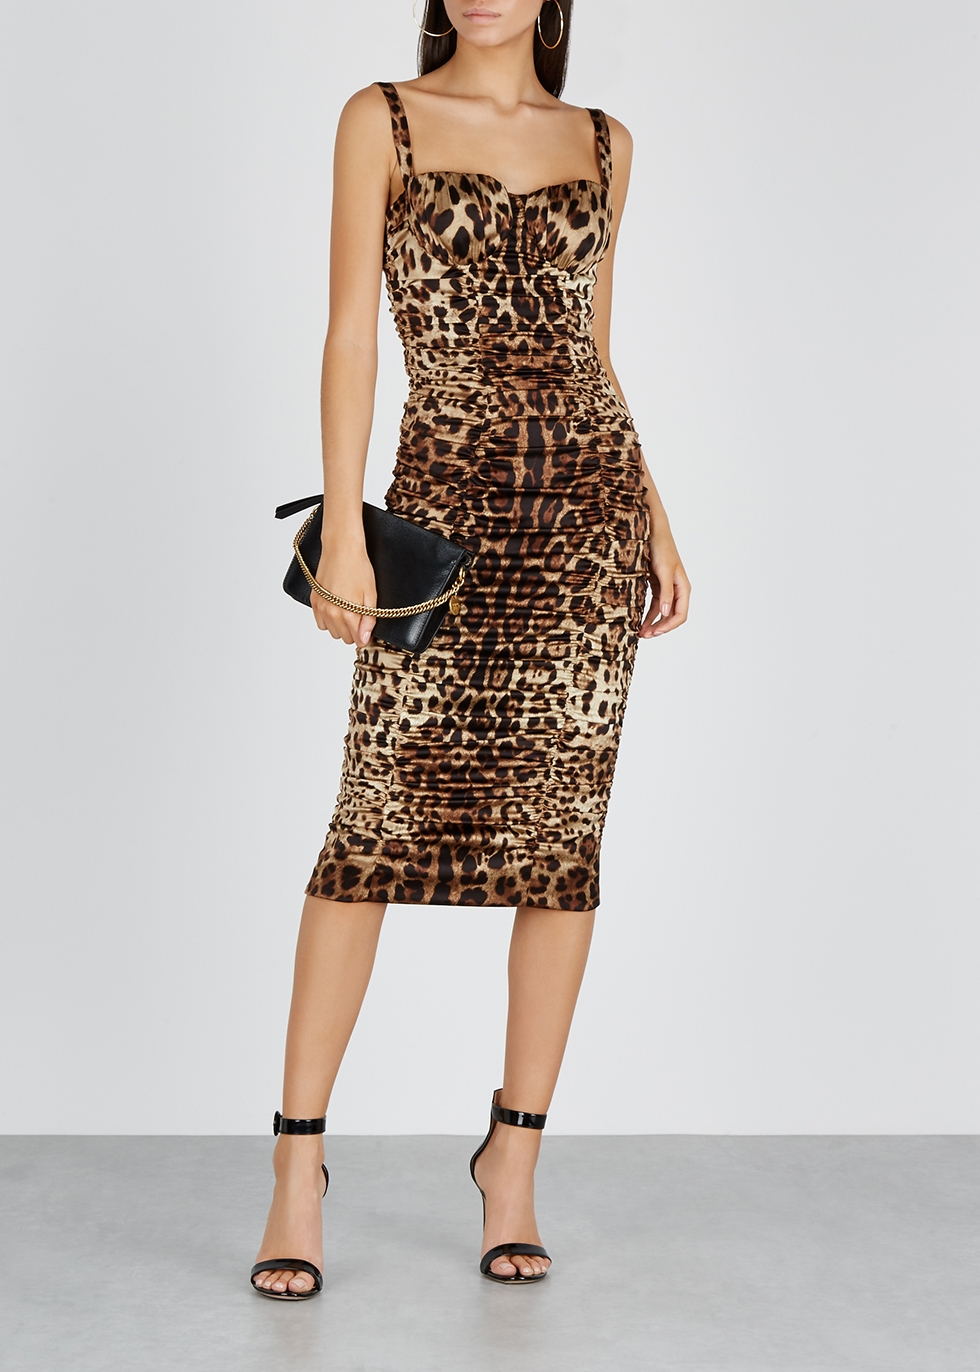 4c6243e0b1 Dolce   Gabbana - Harvey Nichols